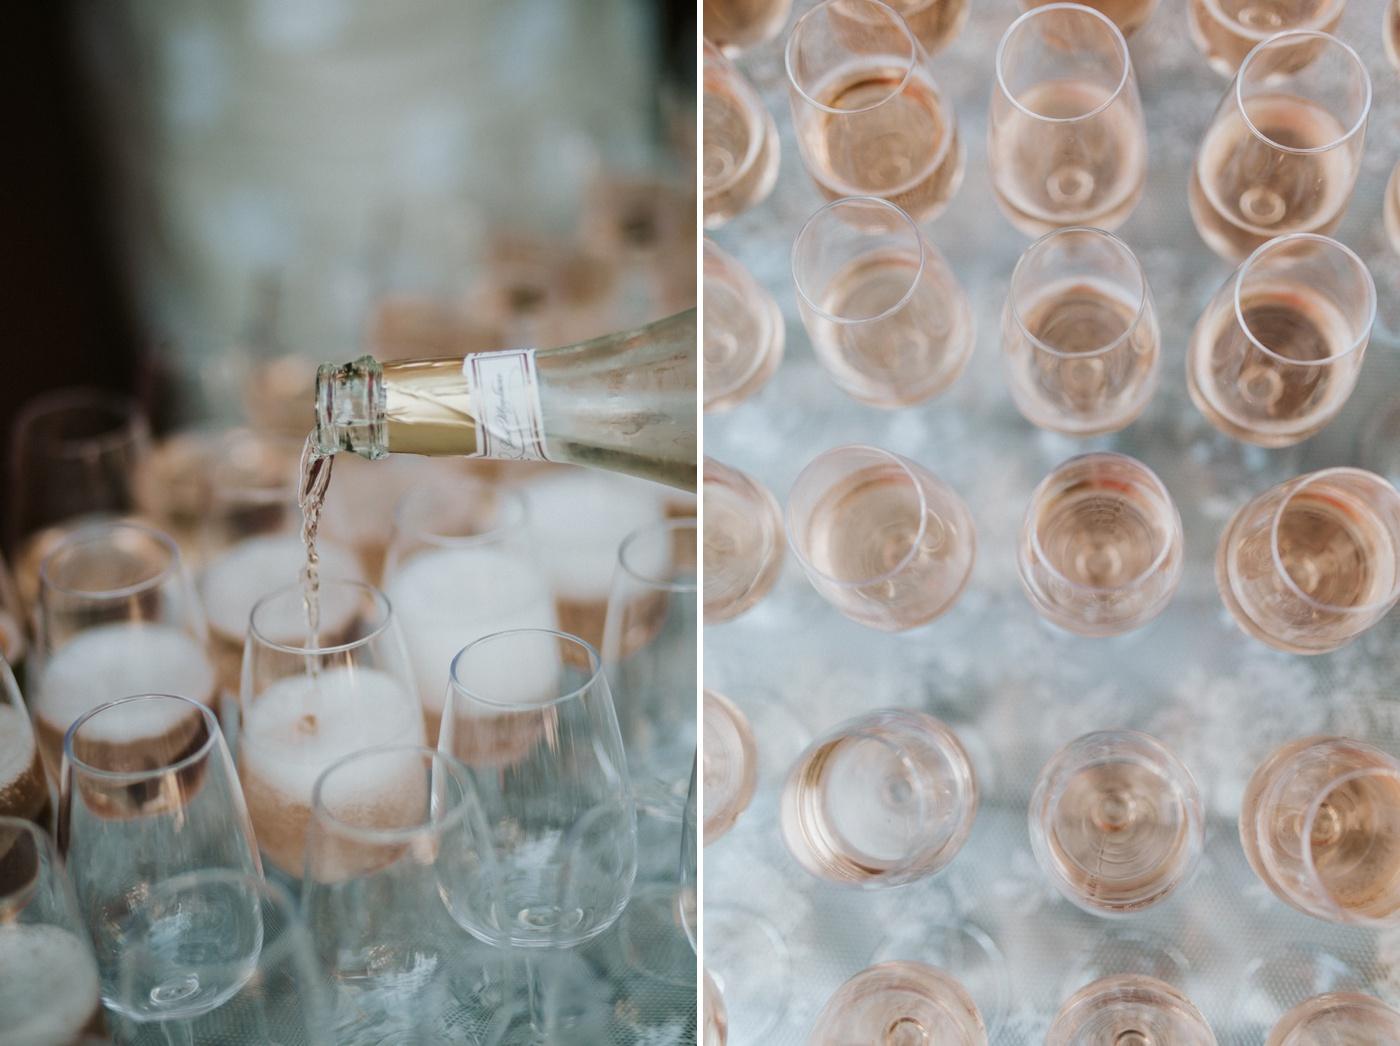 ceciliajoakim_sweden-countryside-summer-wedding_melbourne-fun-quirky-wedding-photography_61